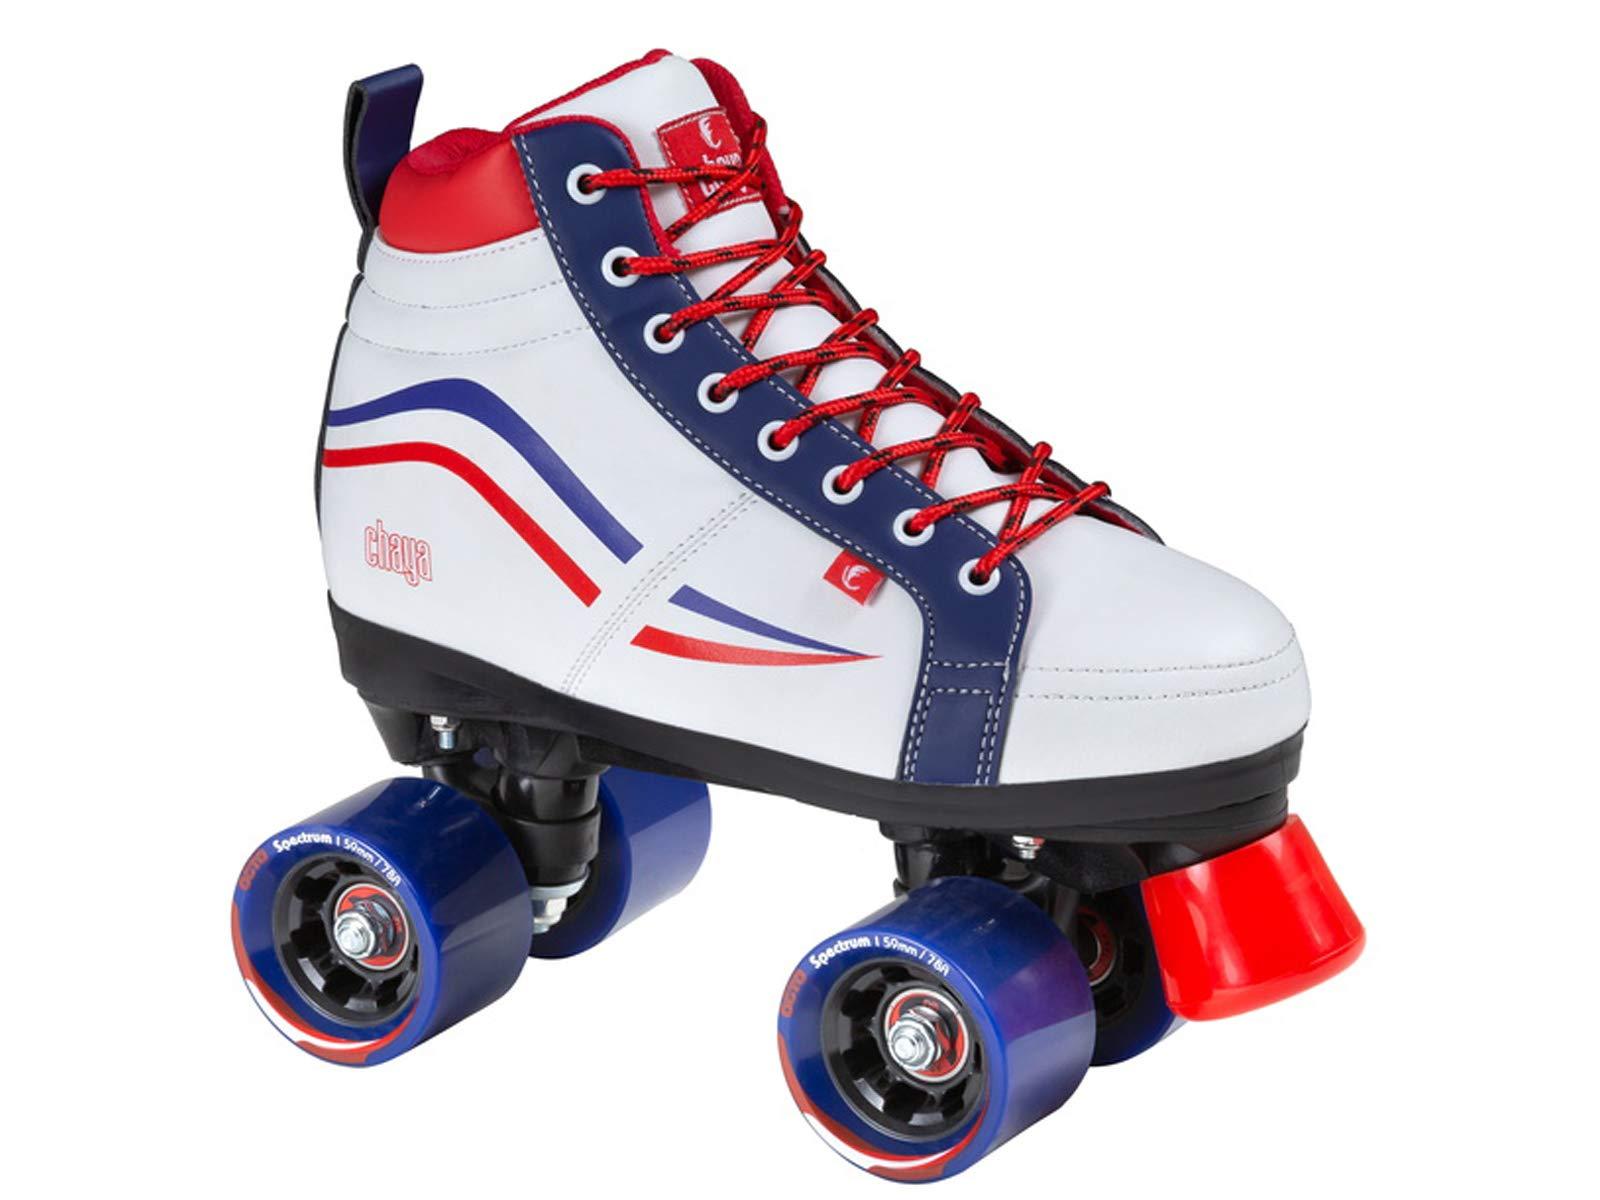 Chaya New Vintage Glide White Red & Blue Quad Roller Skates - Vegan (Euro 39 / US 8)